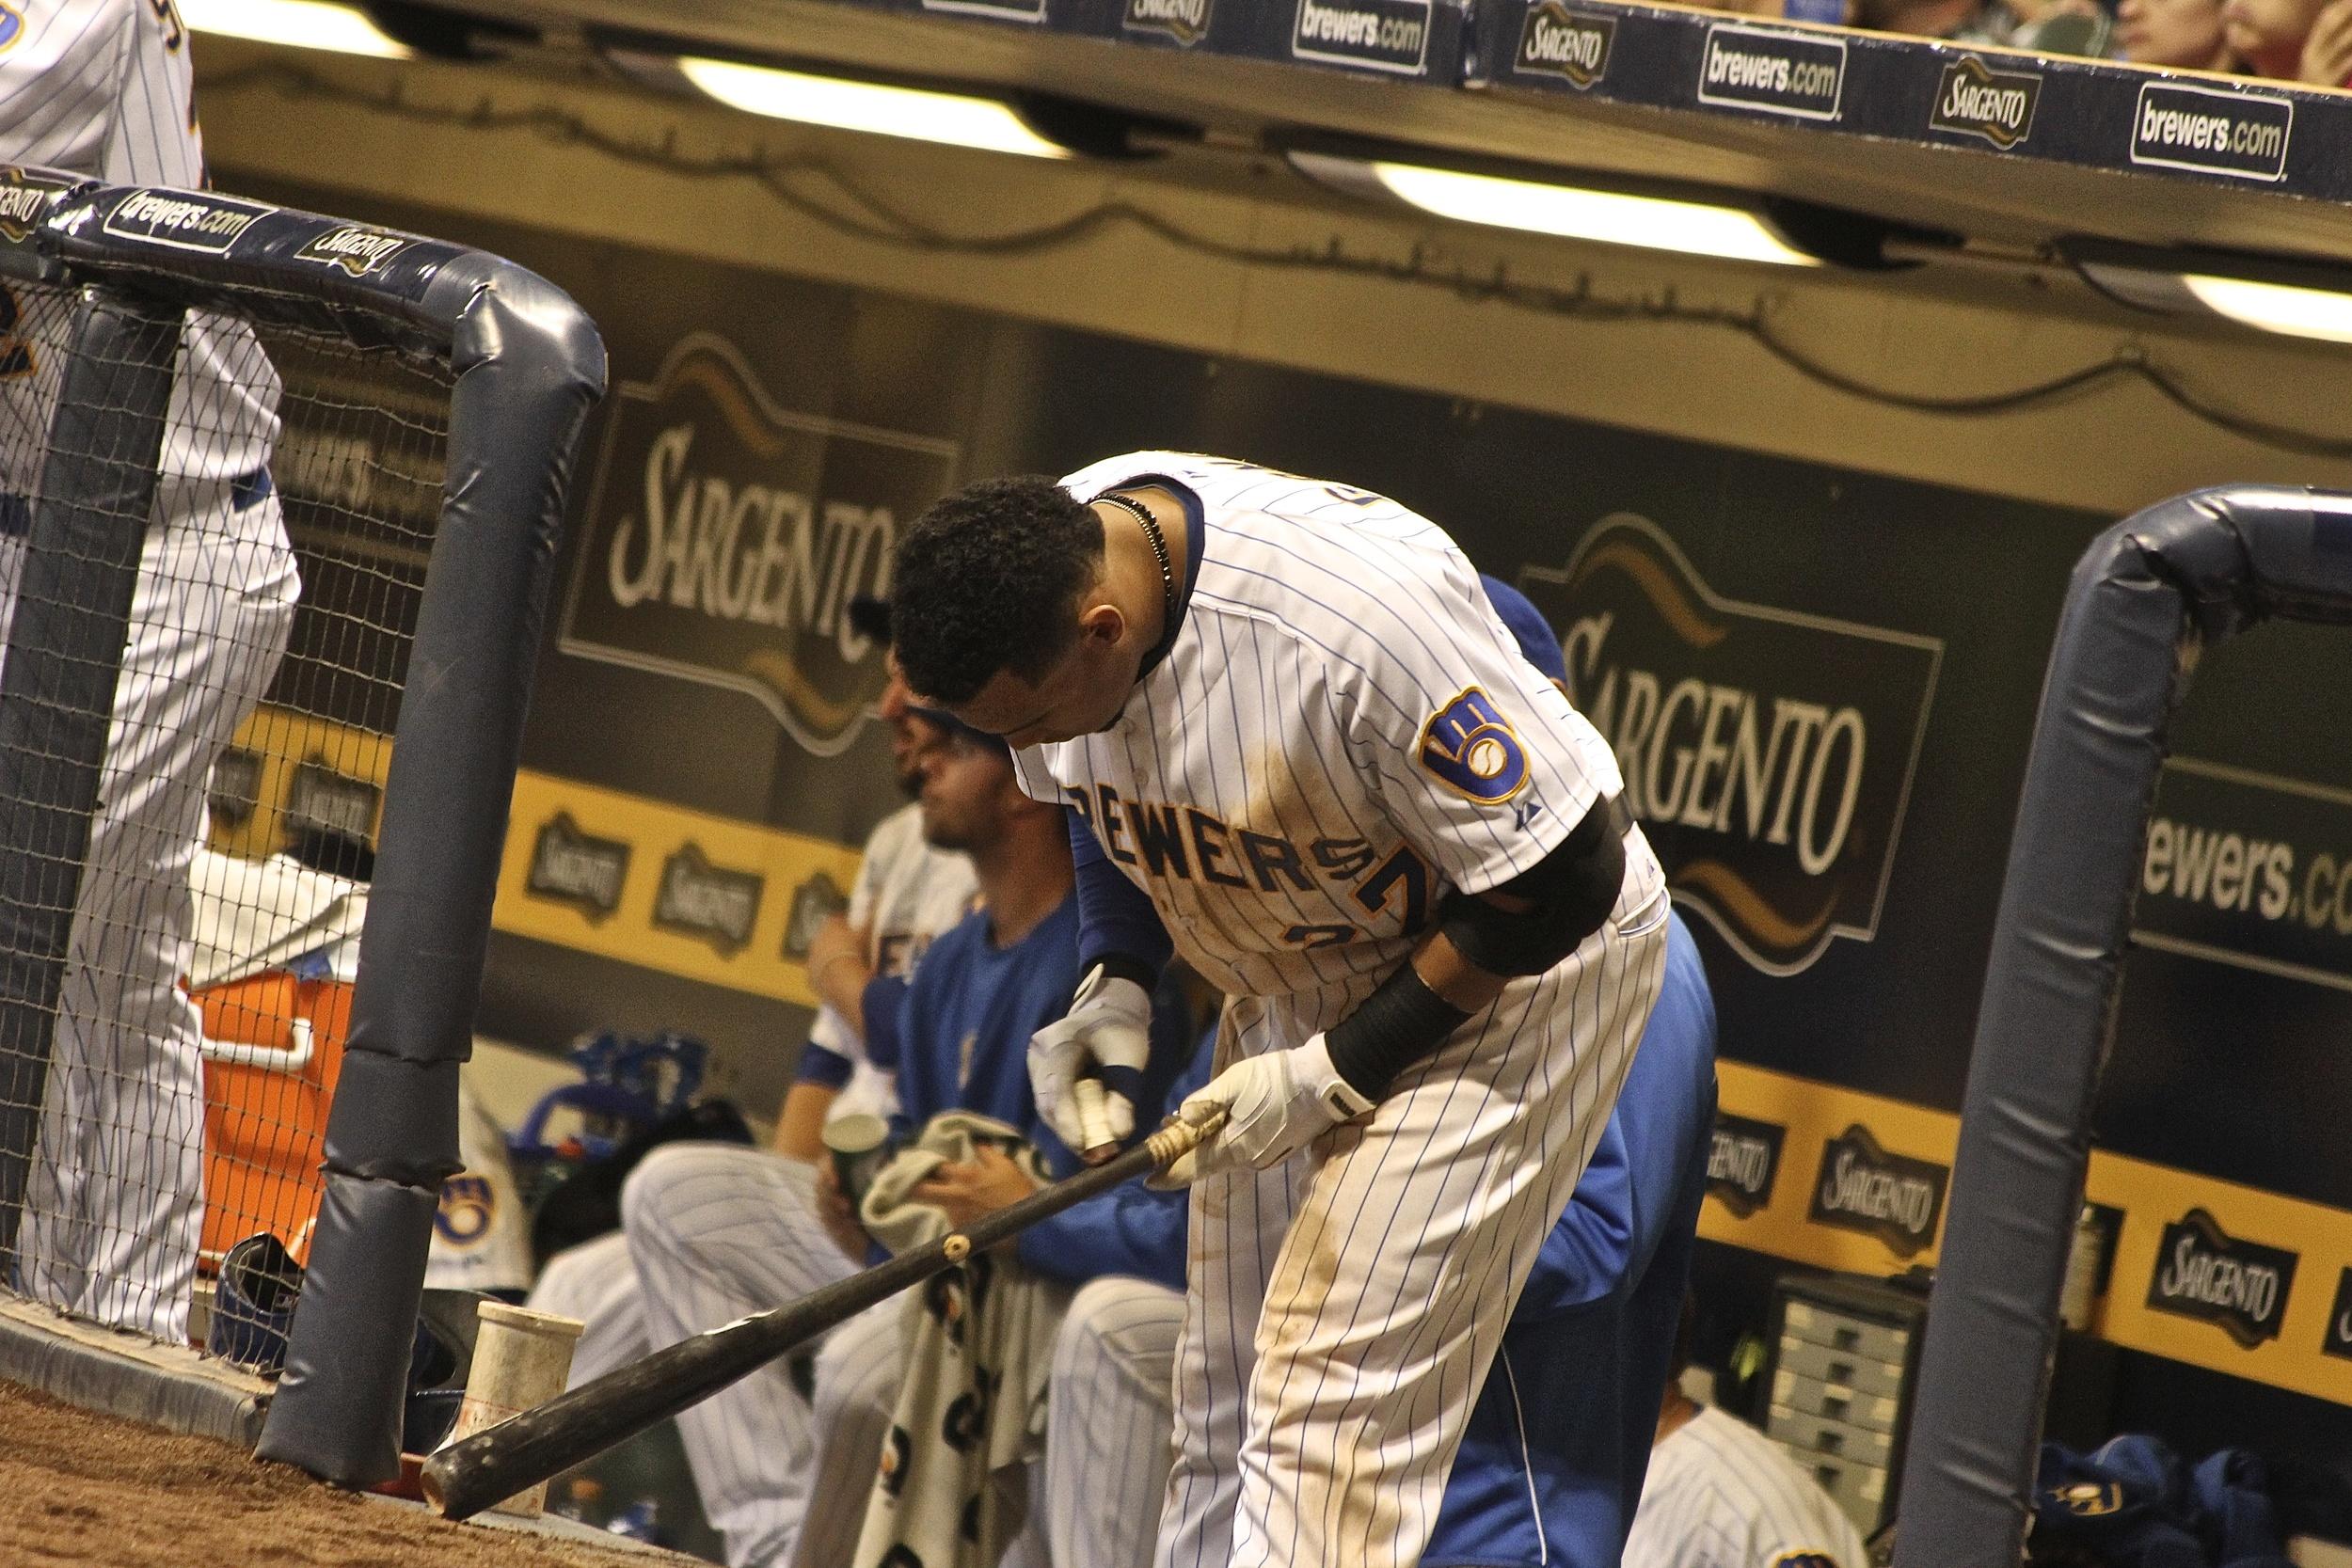 Carlos Gomez preparing his bat